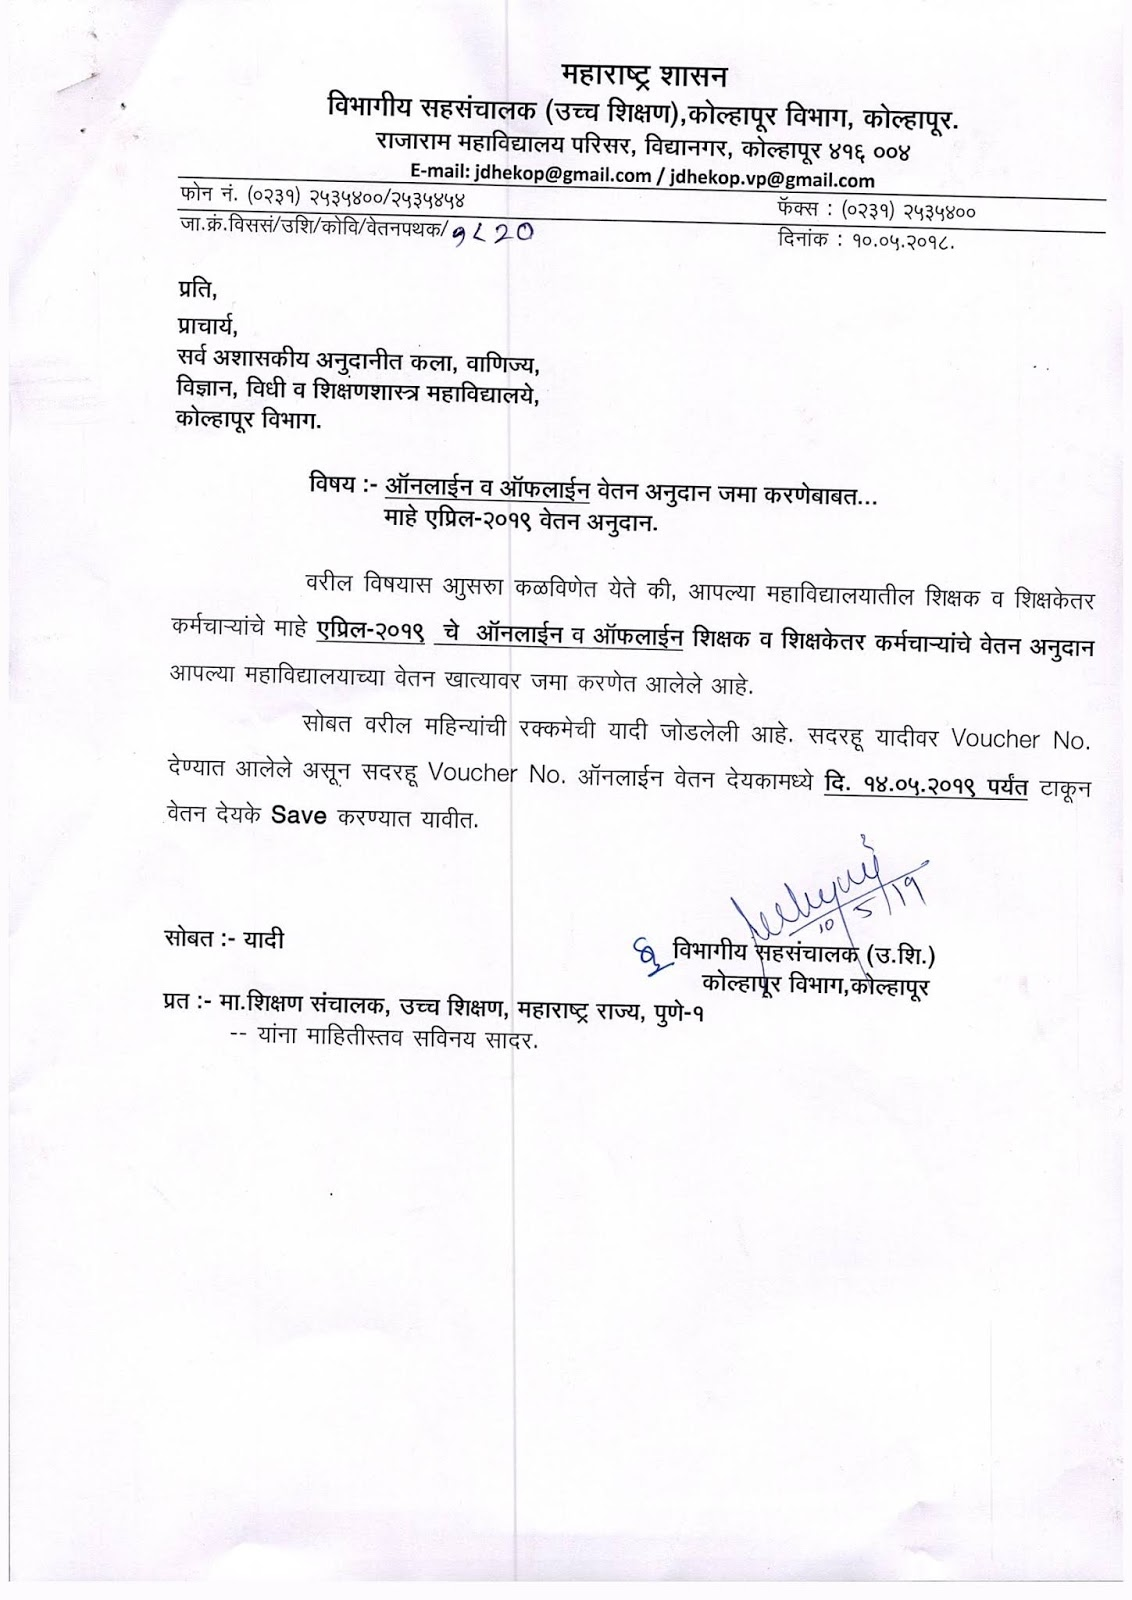 Salary April - 19 | Joint Director Higher Education ,Kolhapur